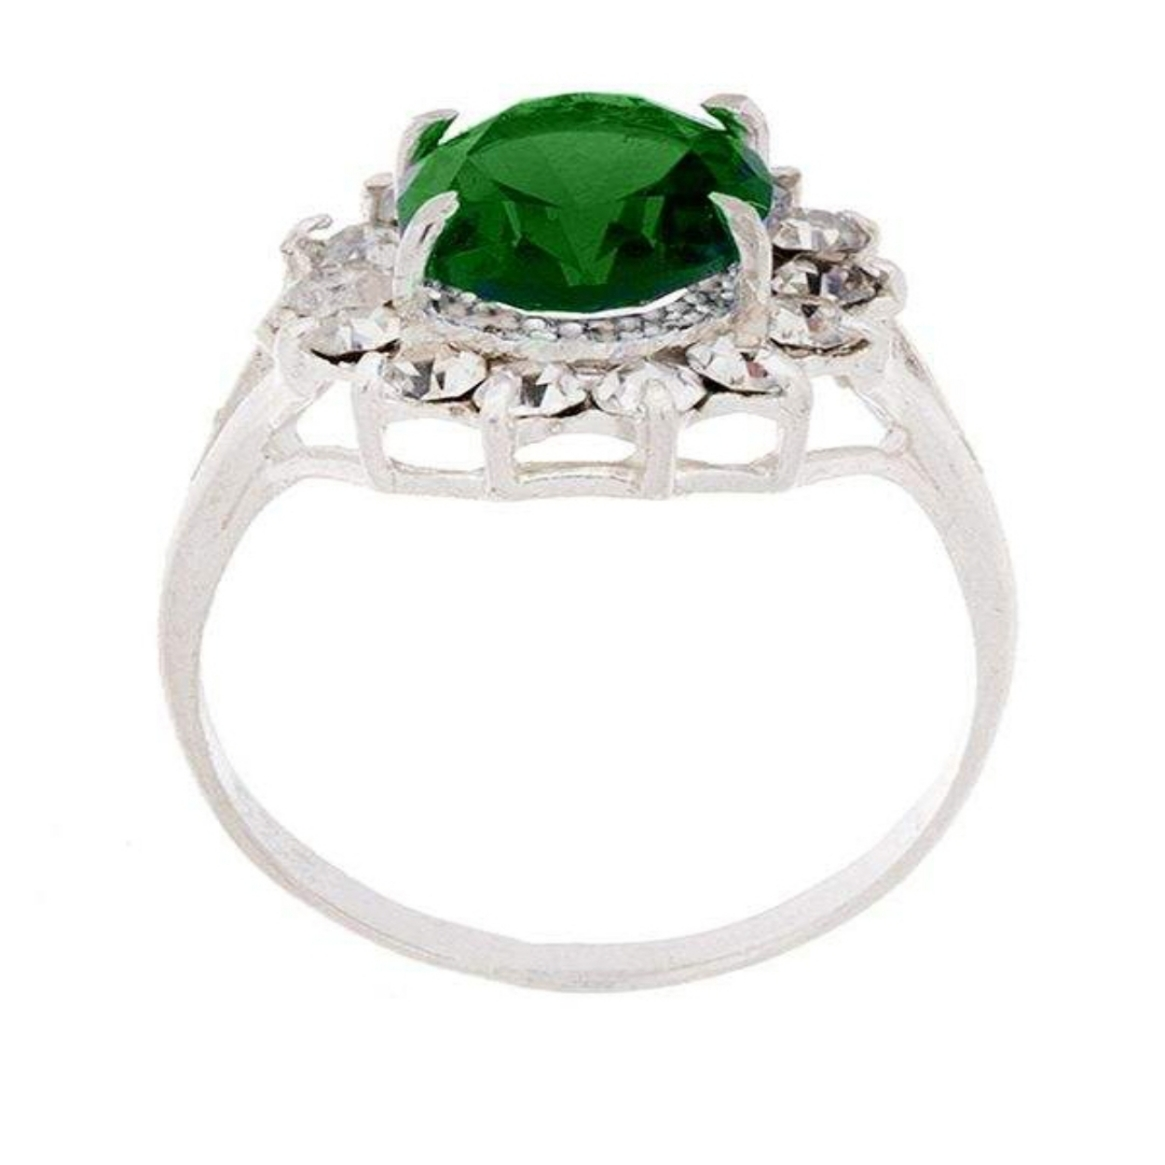 قیمت انگشتر نقره زنانه کد p460